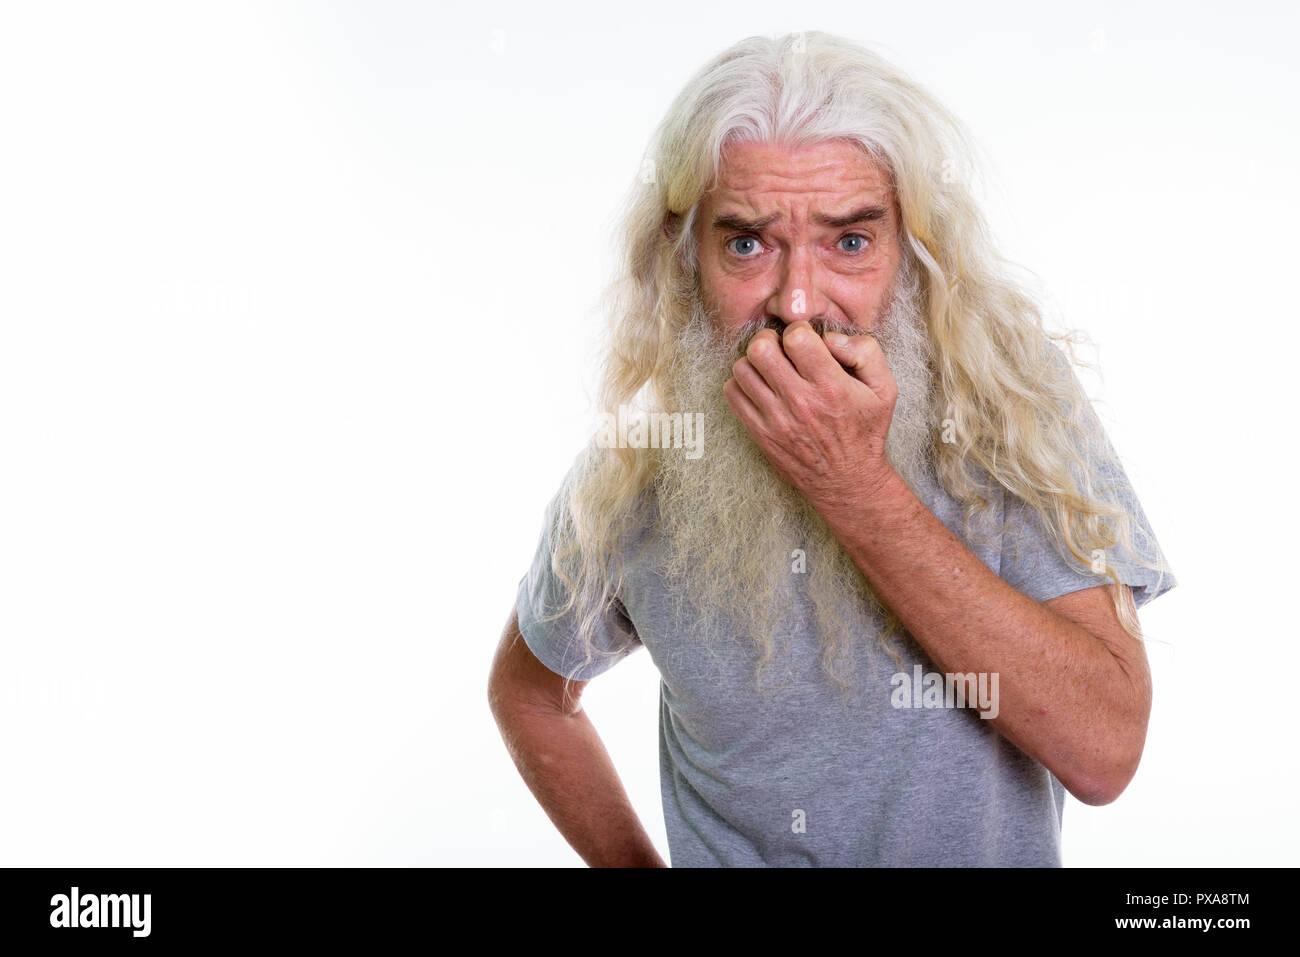 Studio shot der älteren bärtigen Mann Angst, während die Stockbild